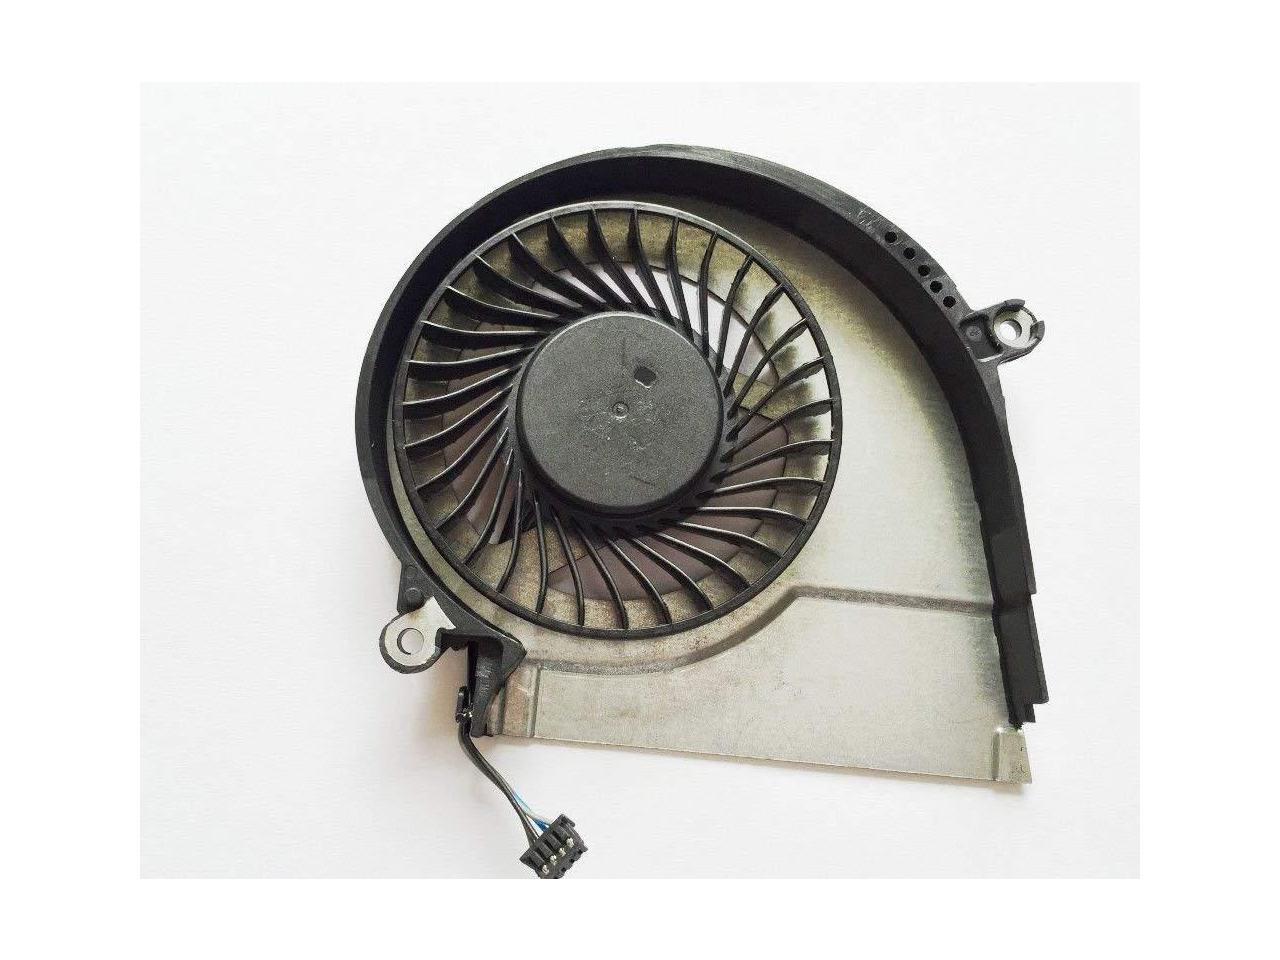 New CPU Cooling Fan For HP Pavilion 17-e180nr 17-e181nr 17-e182nr 17-e183nr 17-e184ca 17-e184nr 17-e185nr 17-e186nr 17-e187nr 17-e188nr 17-e189nr 17-e193nr 17-e194nr 17-e195nr